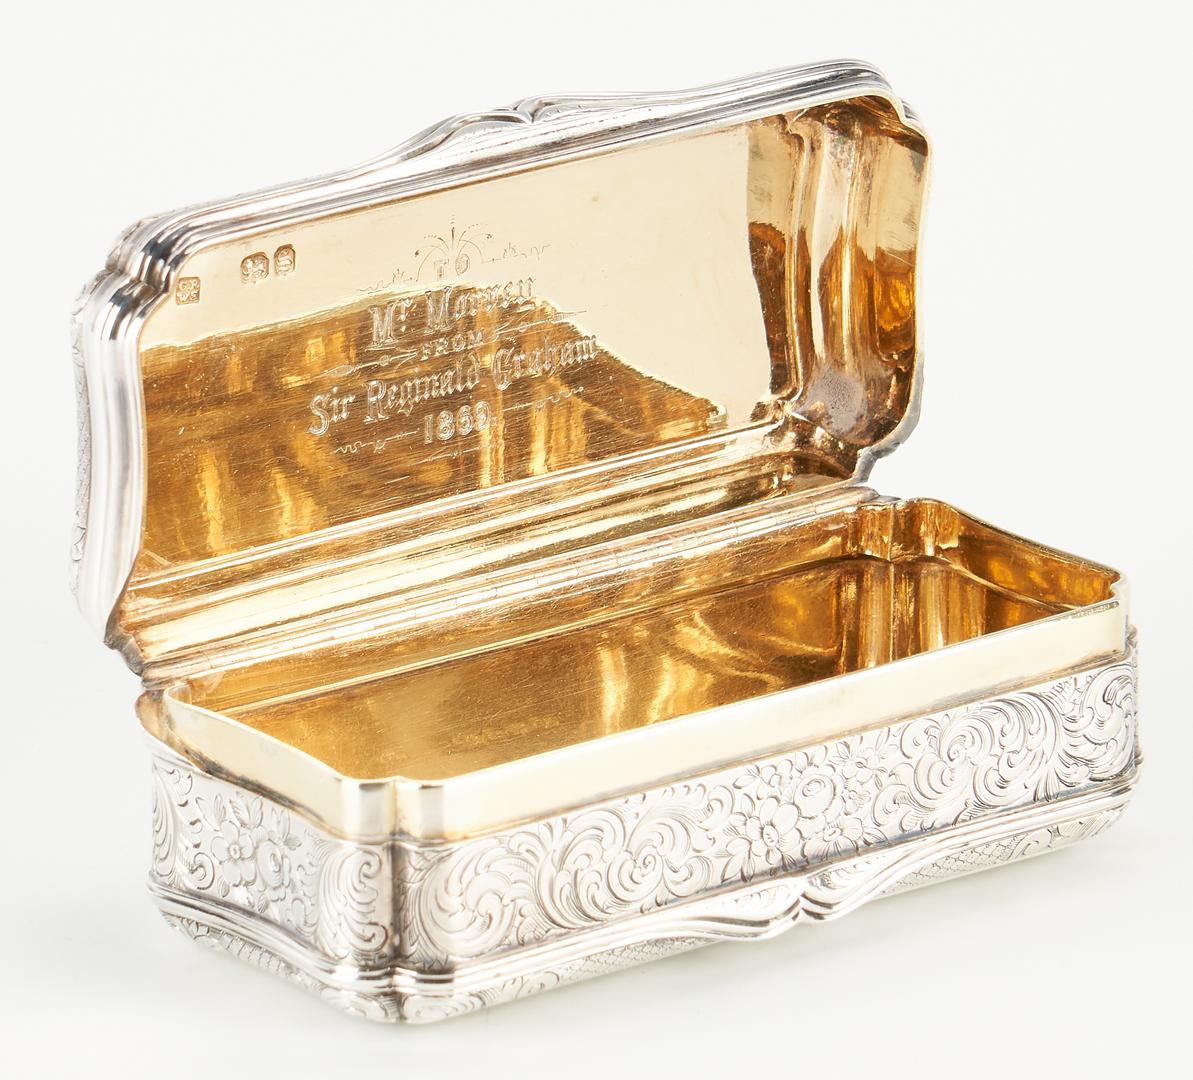 Lot 106: Silver Snuff Box, Sir Reg. Graham Presentation